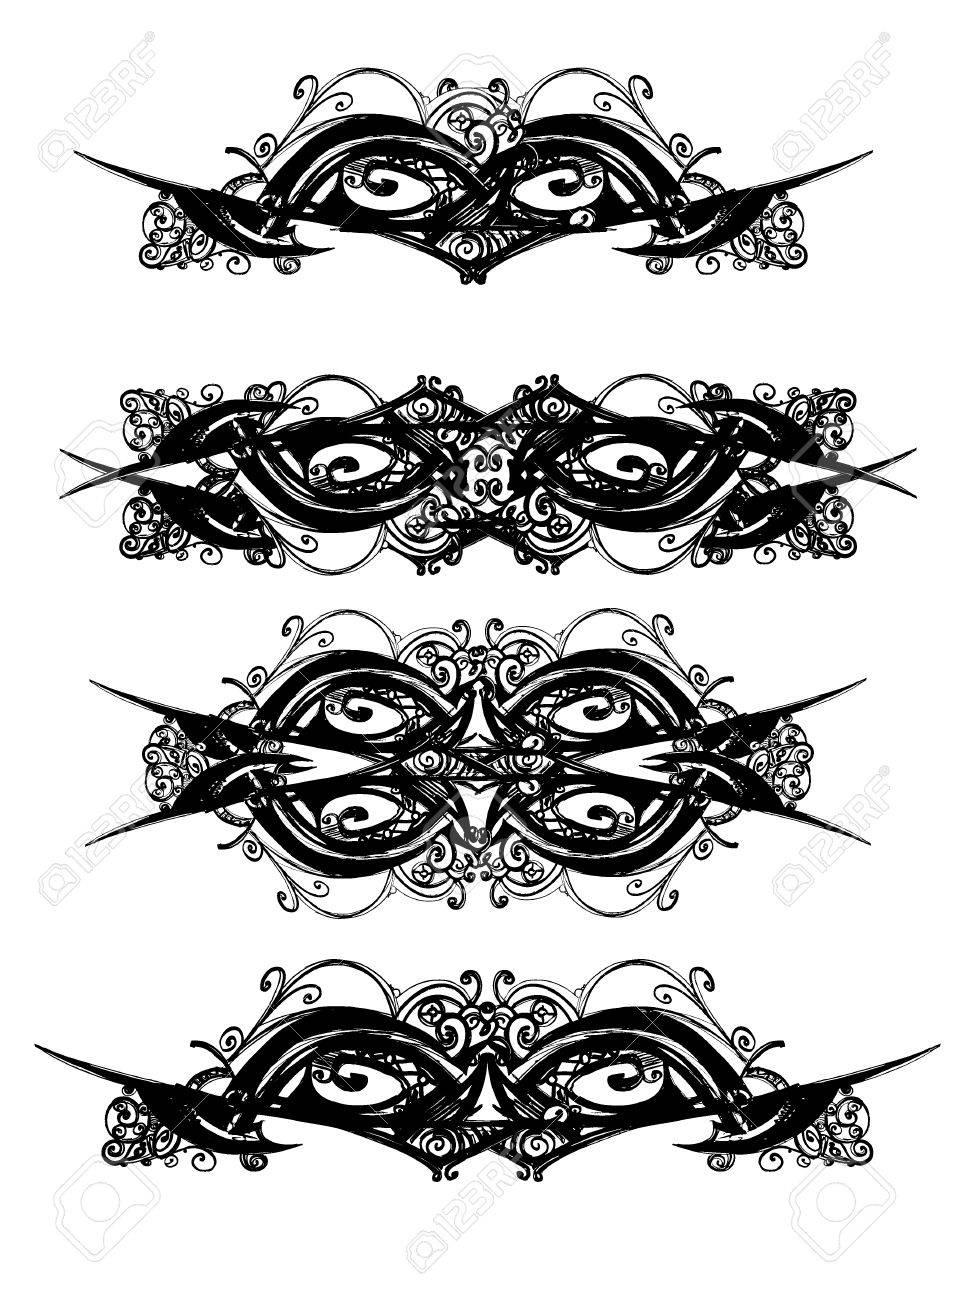 tattoo Stock Vector - 5612410